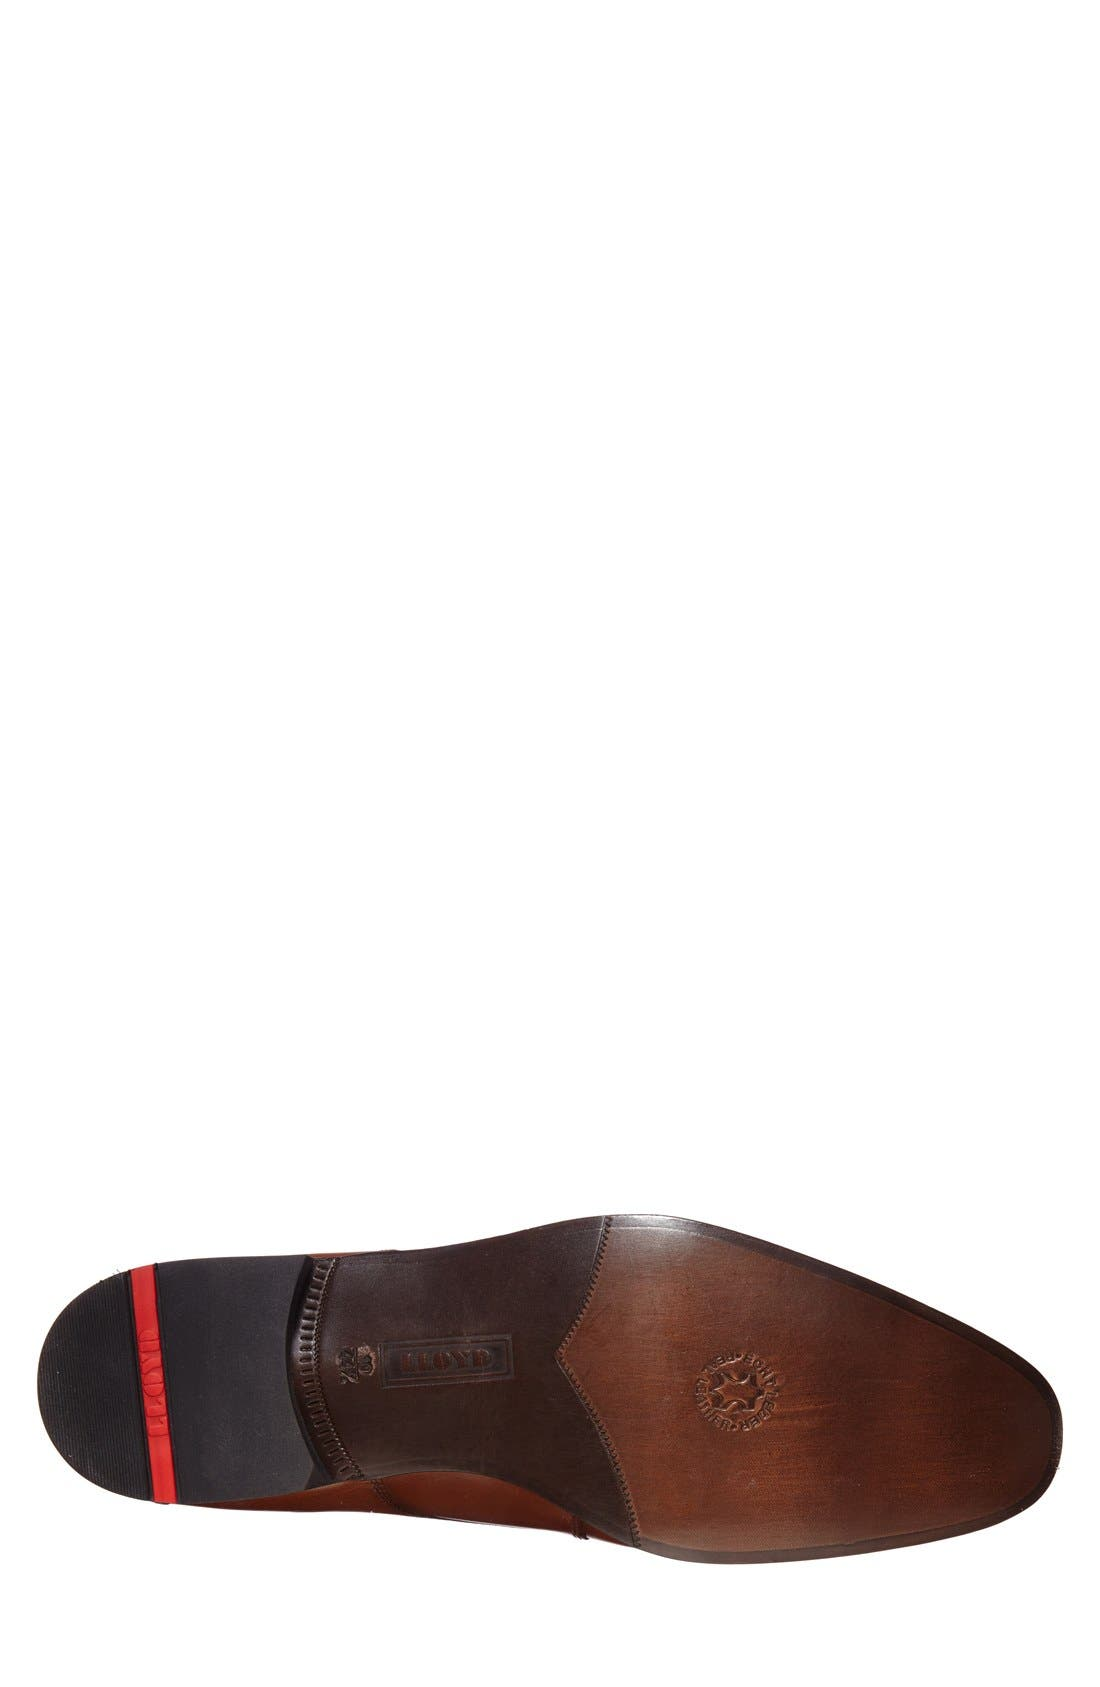 'Laurin' Plain Toe Derby,                             Alternate thumbnail 4, color,                             Light Brown